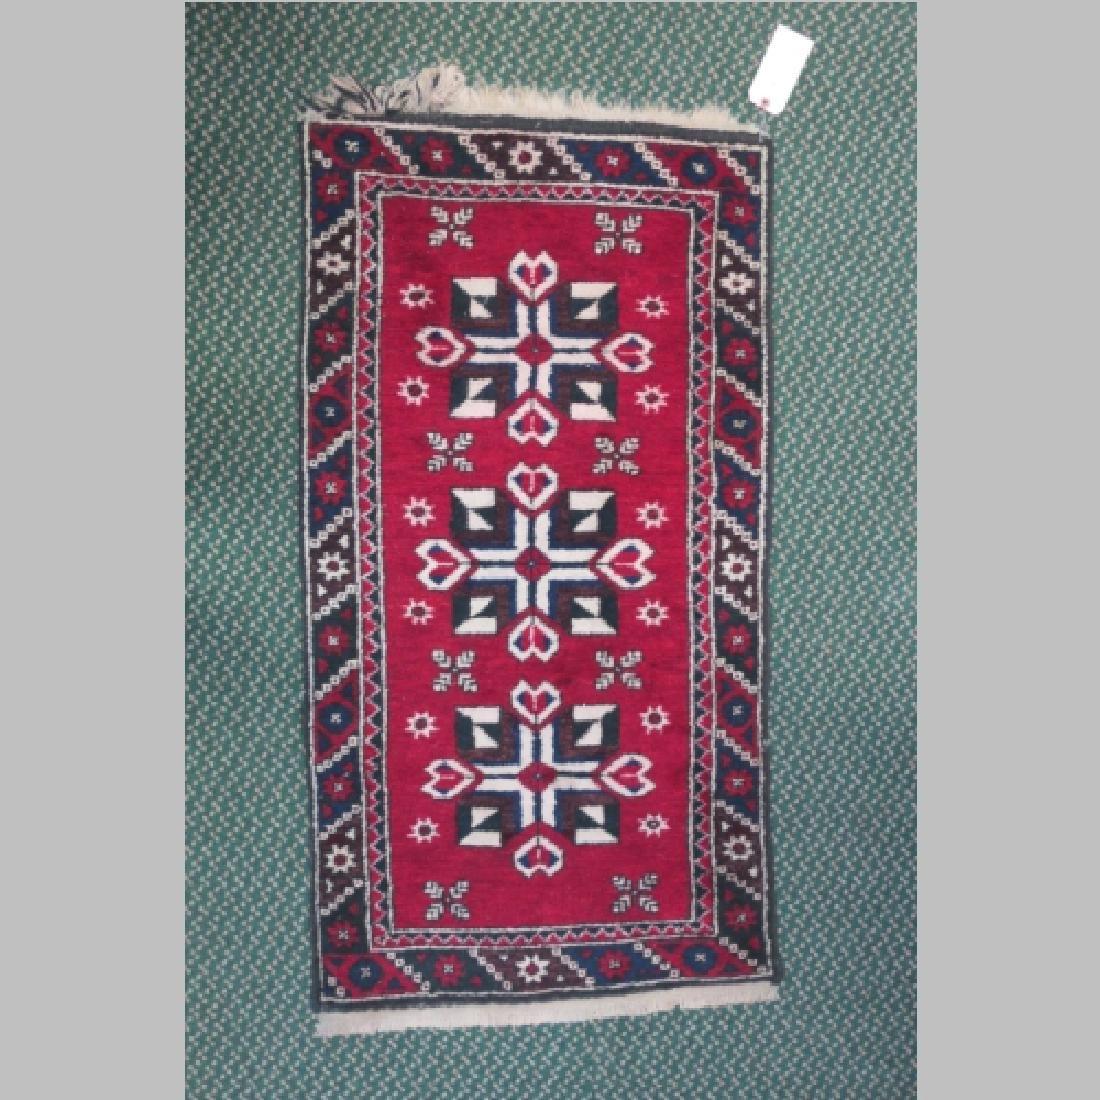 Handwoven Wool Iranian Area Rug: